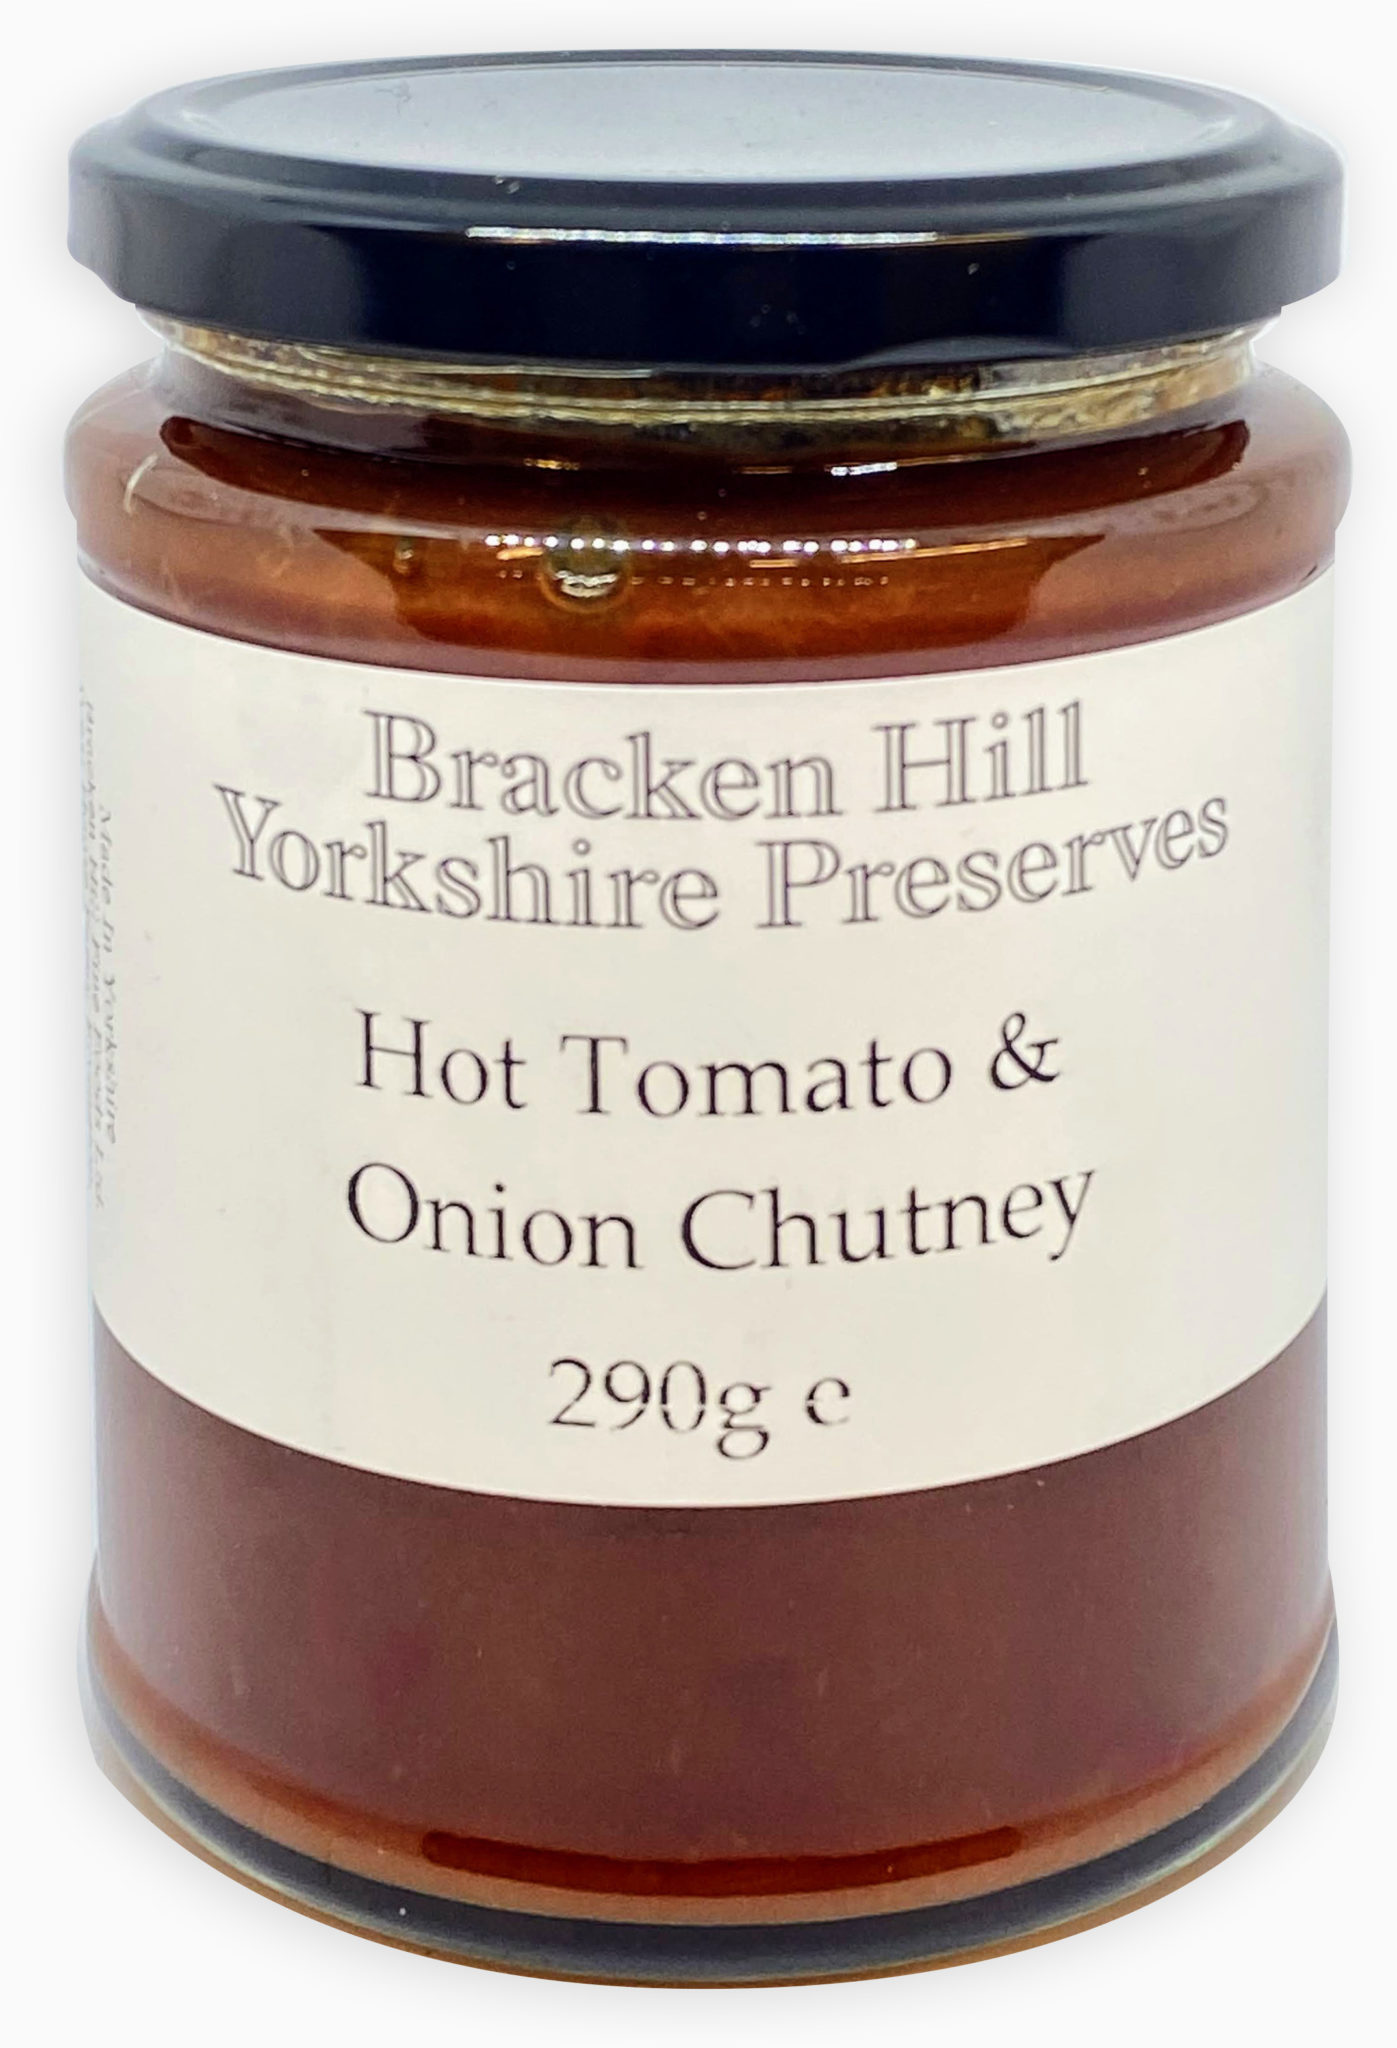 Hot Tomato and Onion Chutney